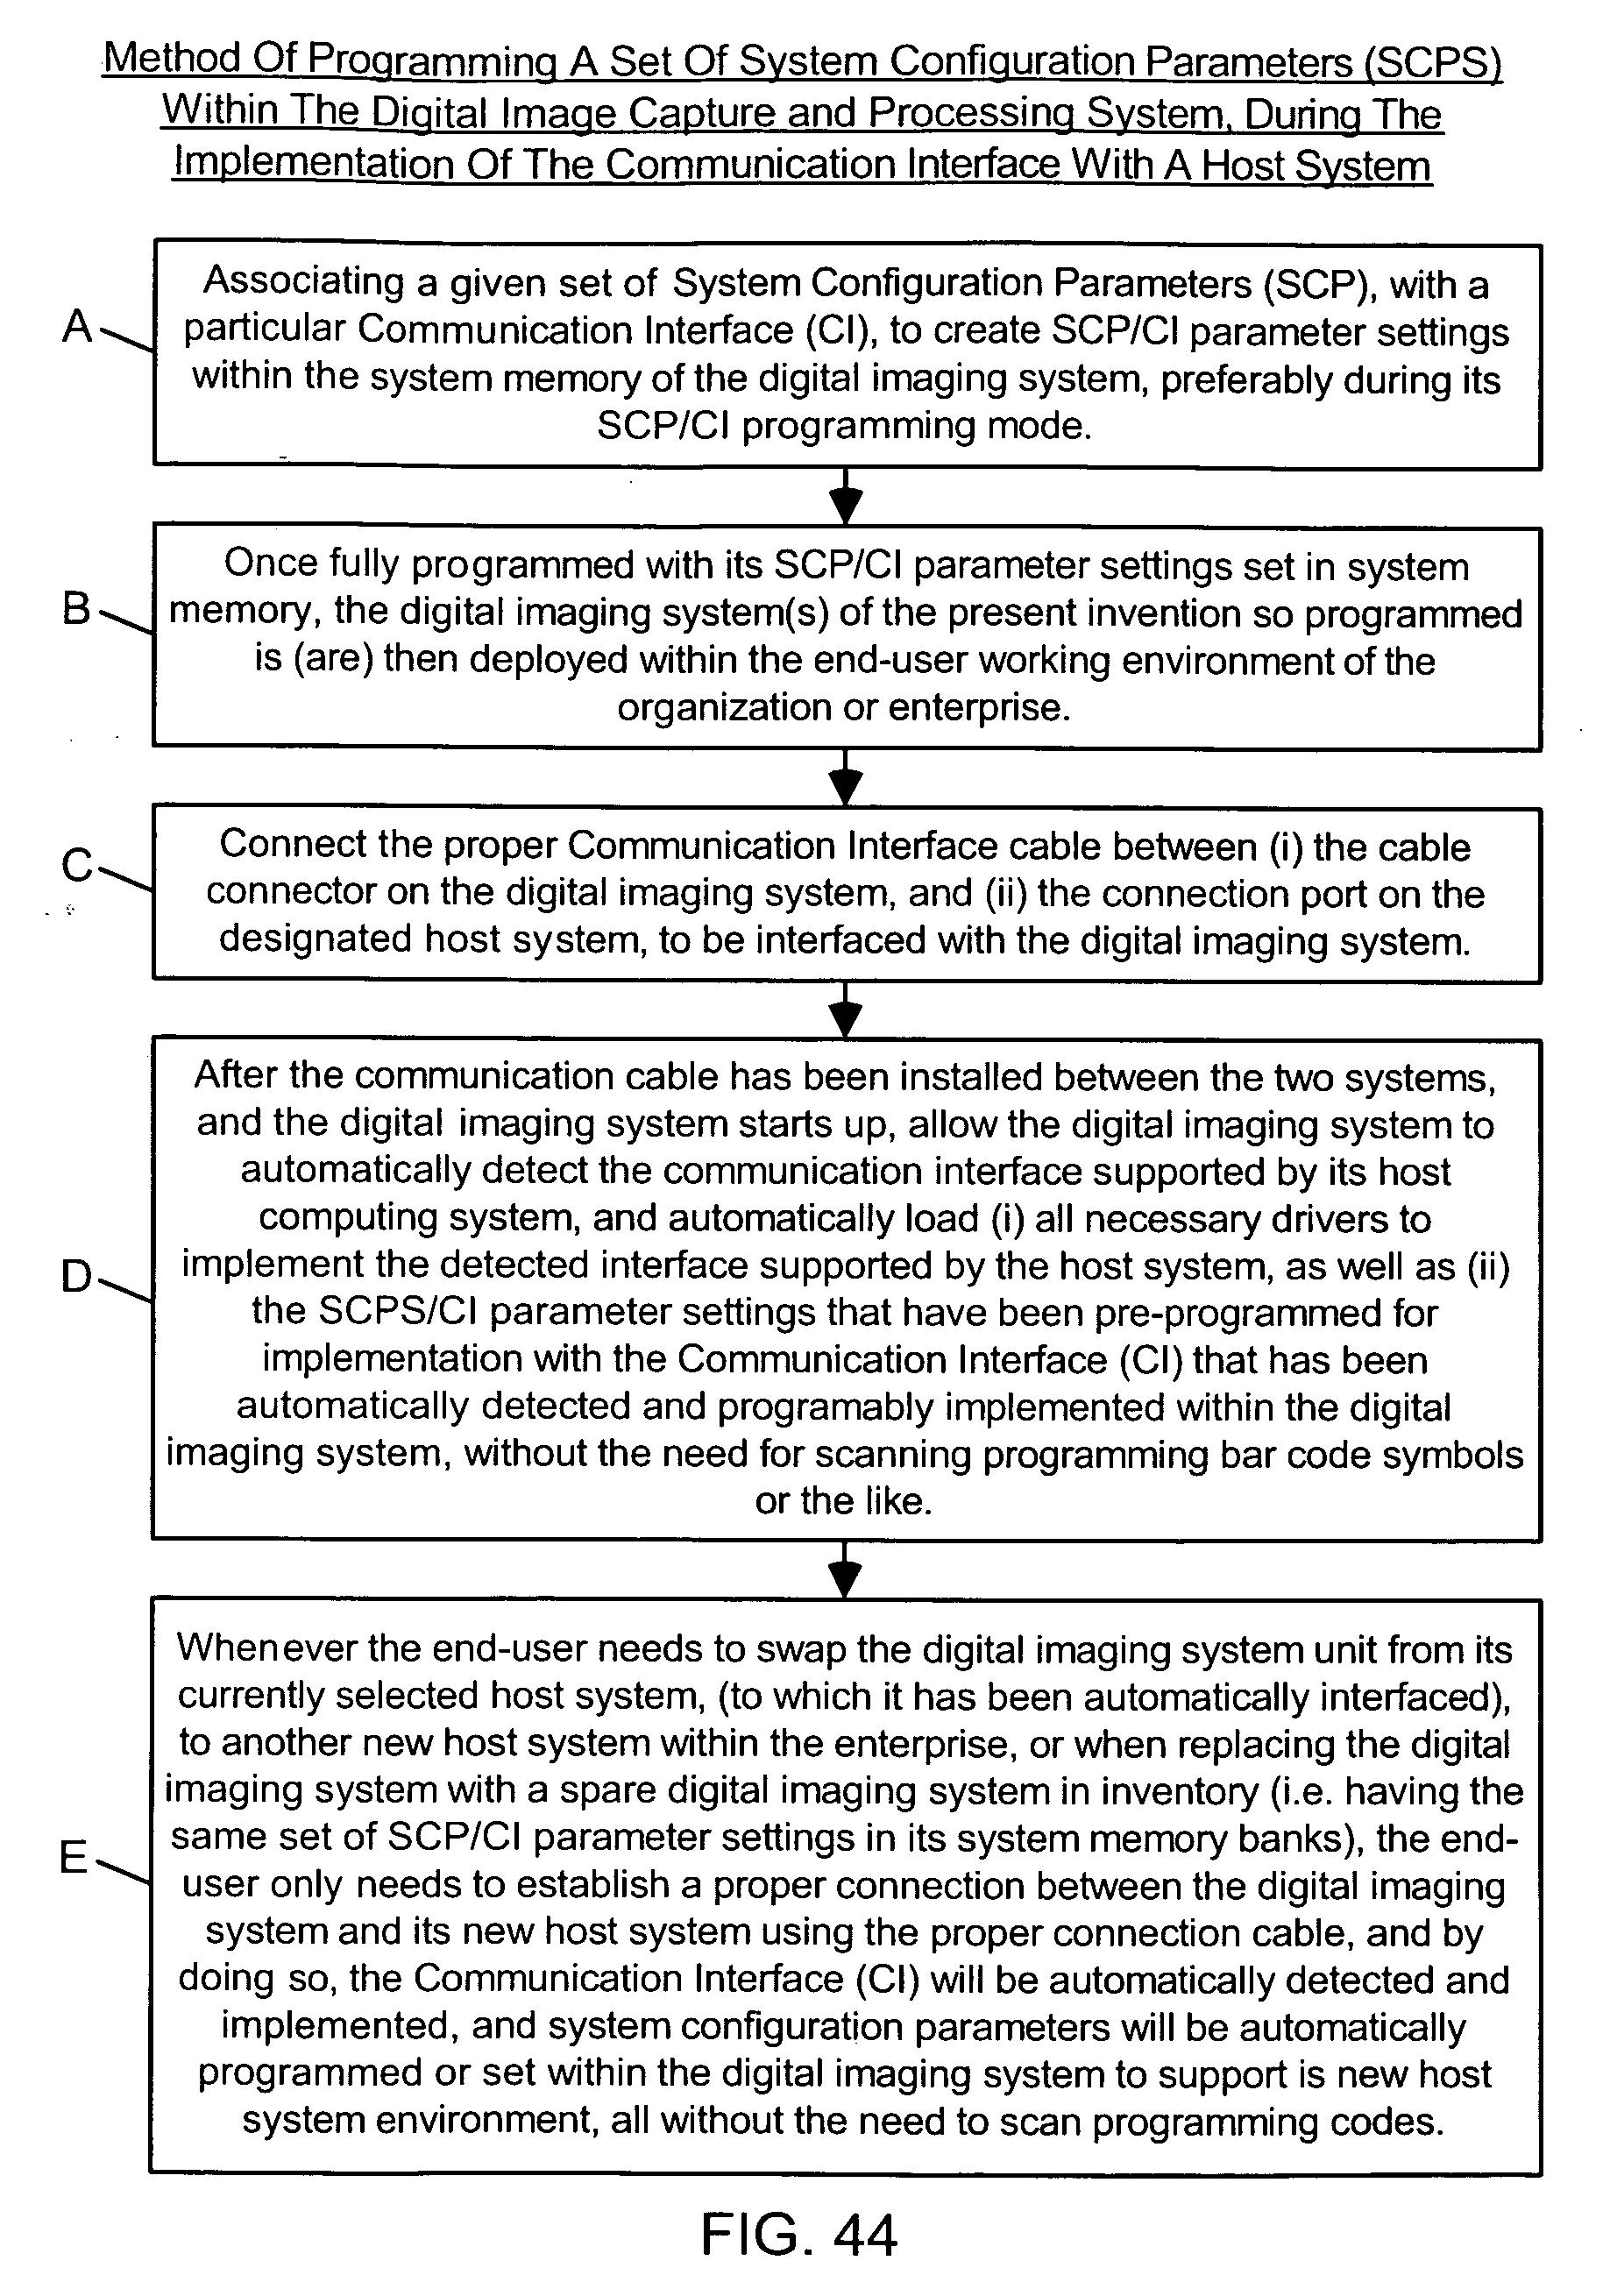 Patent US 7,922,089 B2